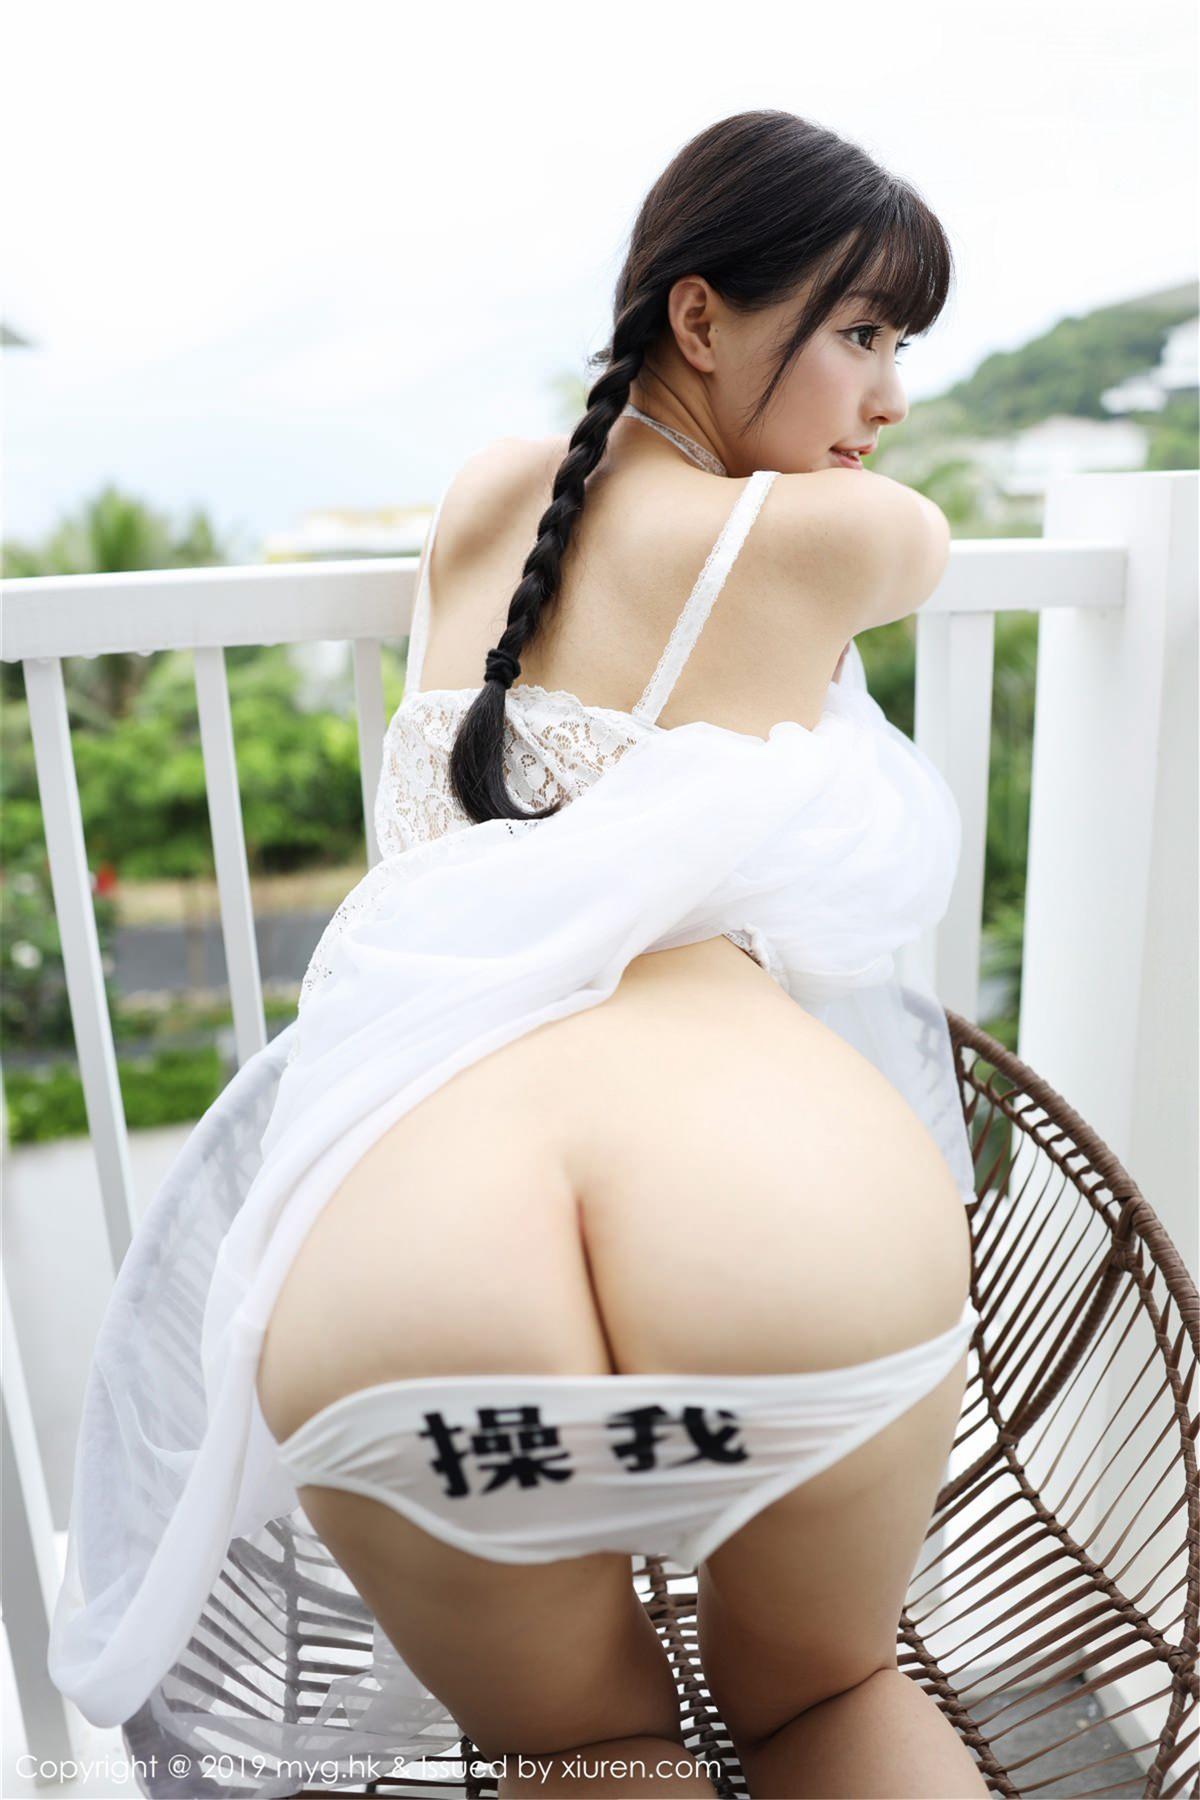 MyGirl Vol.360 48P, mygirl, Zhu Ke Er